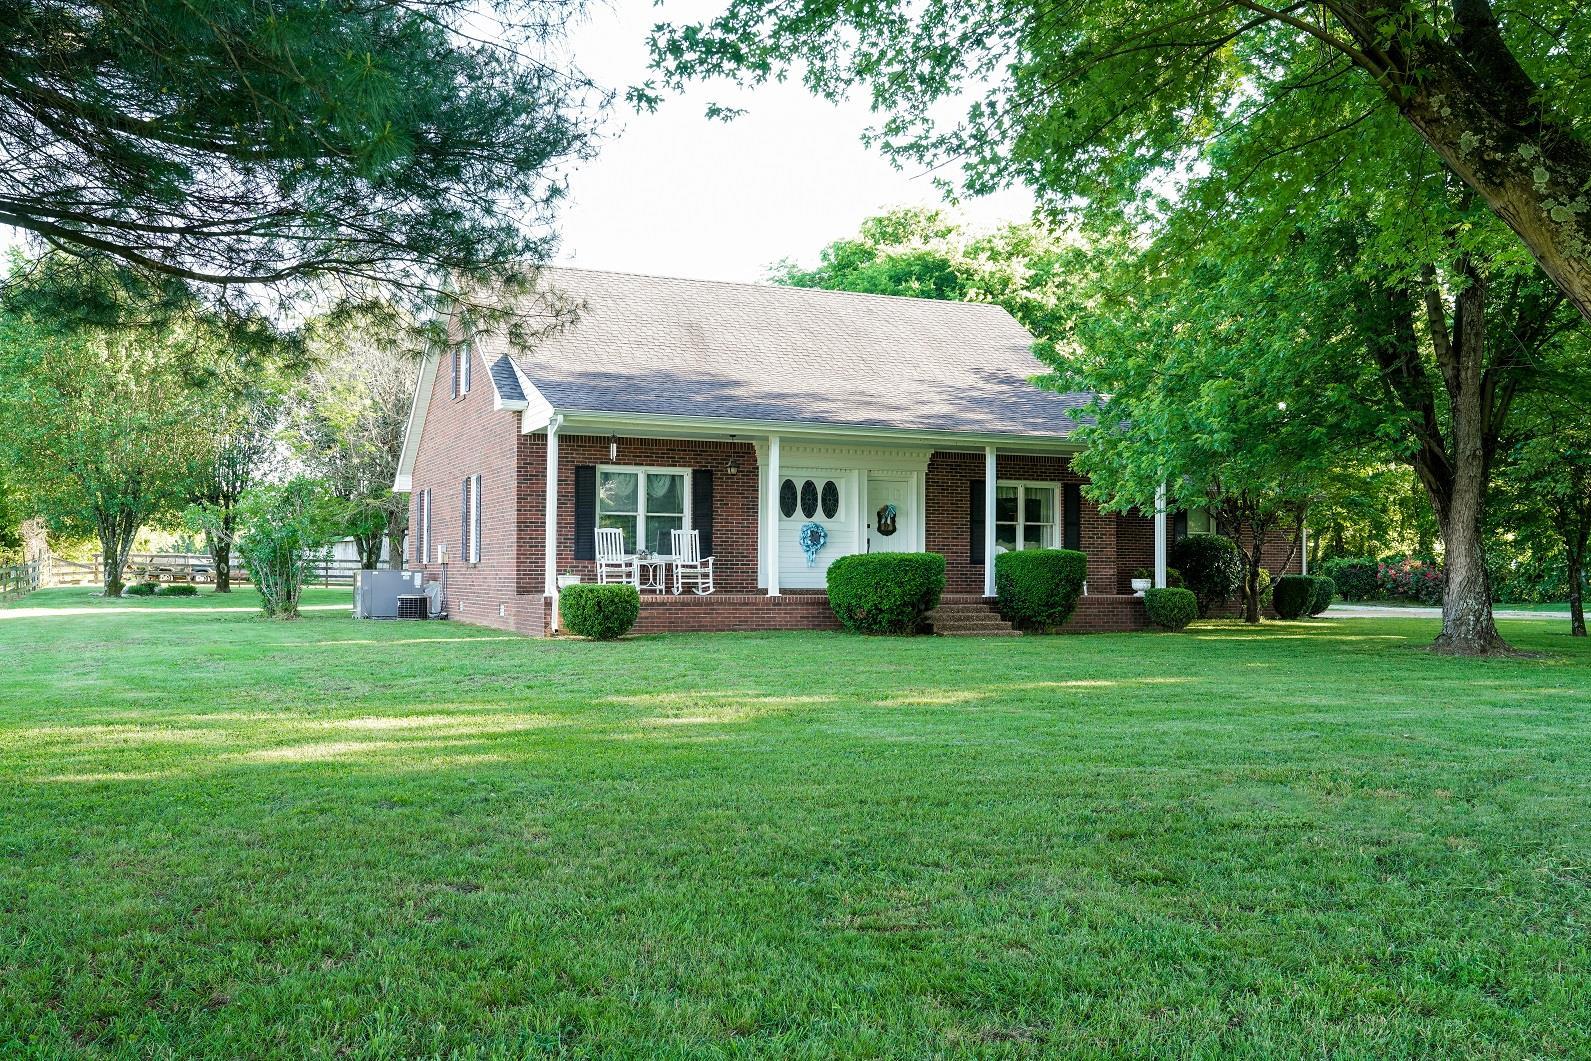 435 Cutoff Rd, Murfreesboro, Tennessee